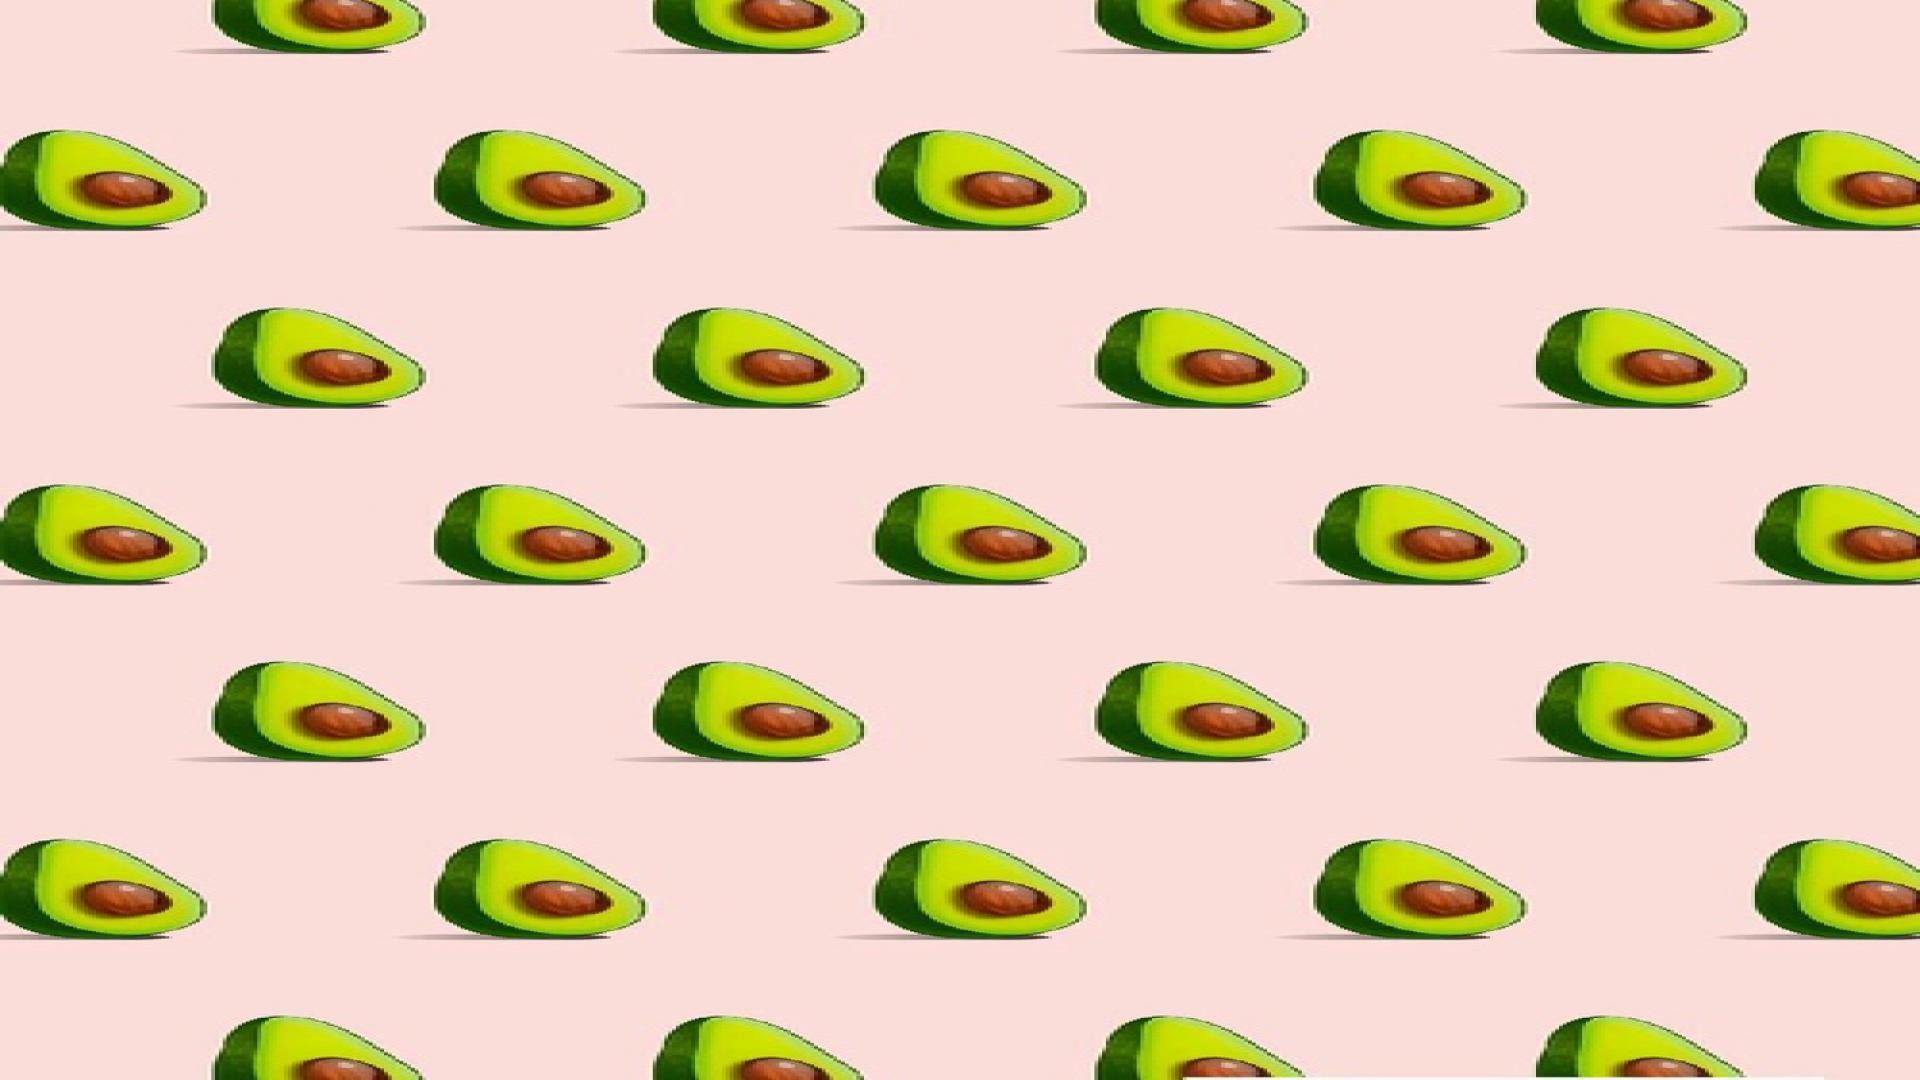 обои на телефон с принтом авокадо кухне сидел